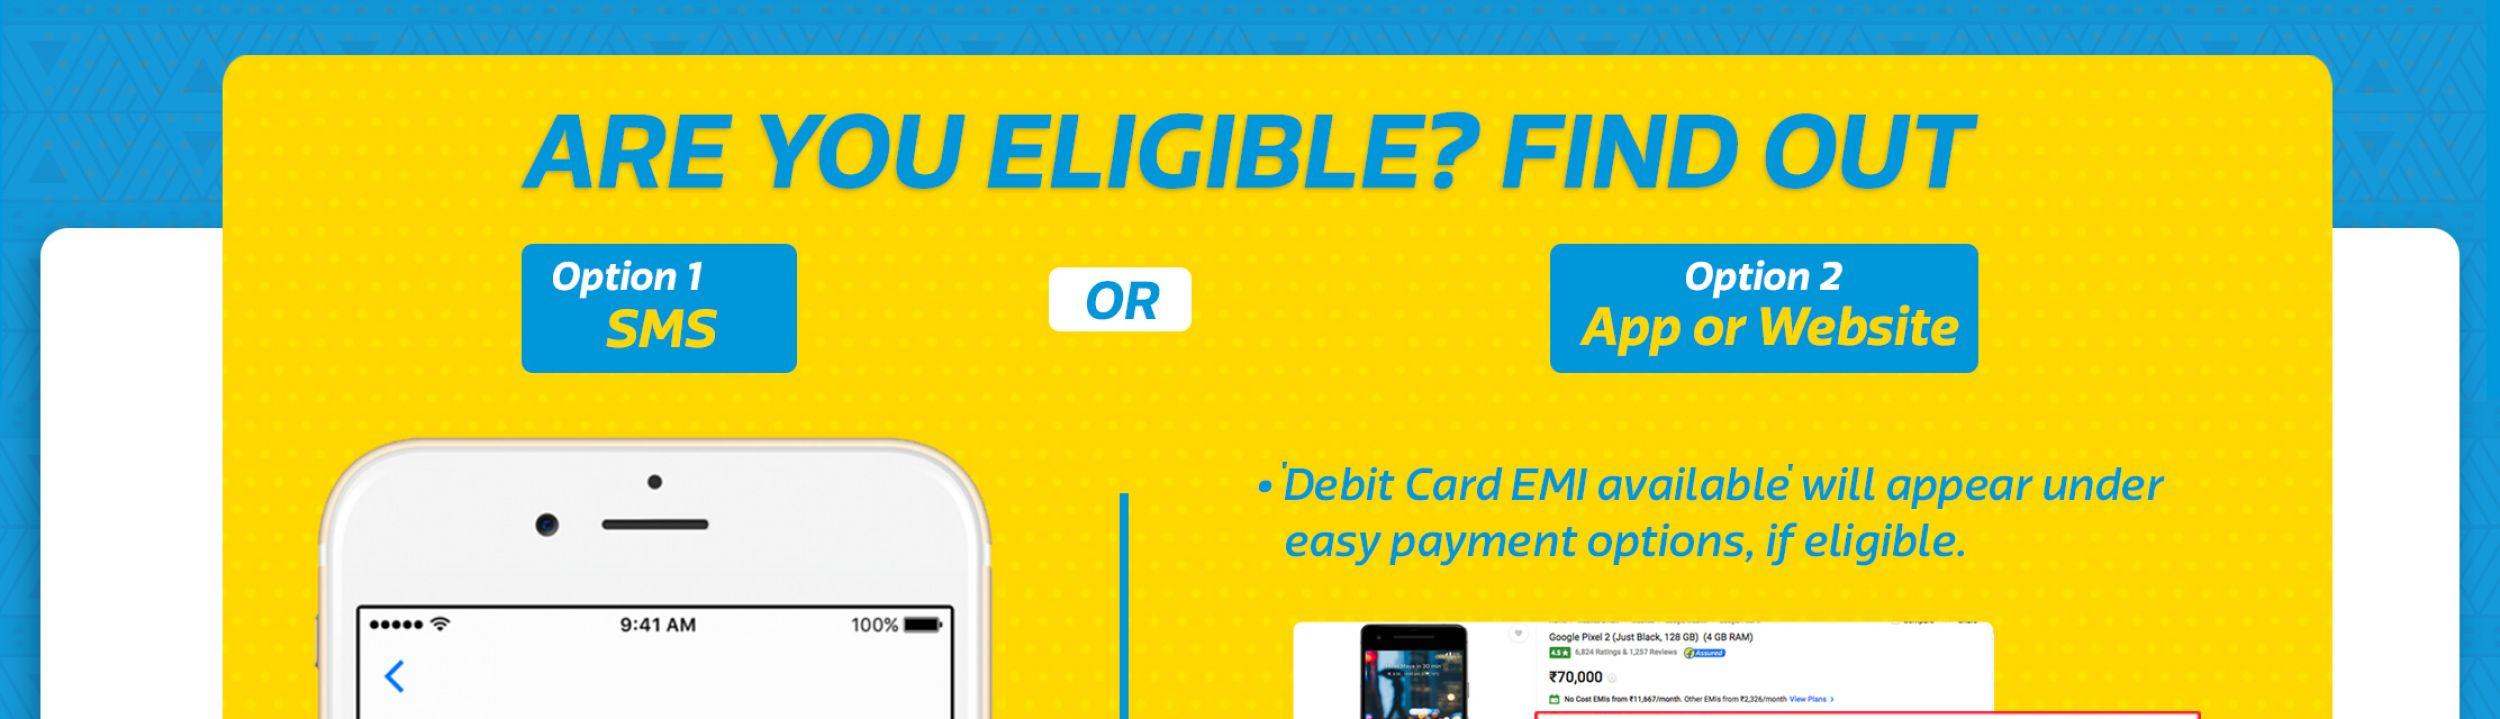 0602b3000 ... EMI on debit card option. sada sada. aqwsass aqwsass